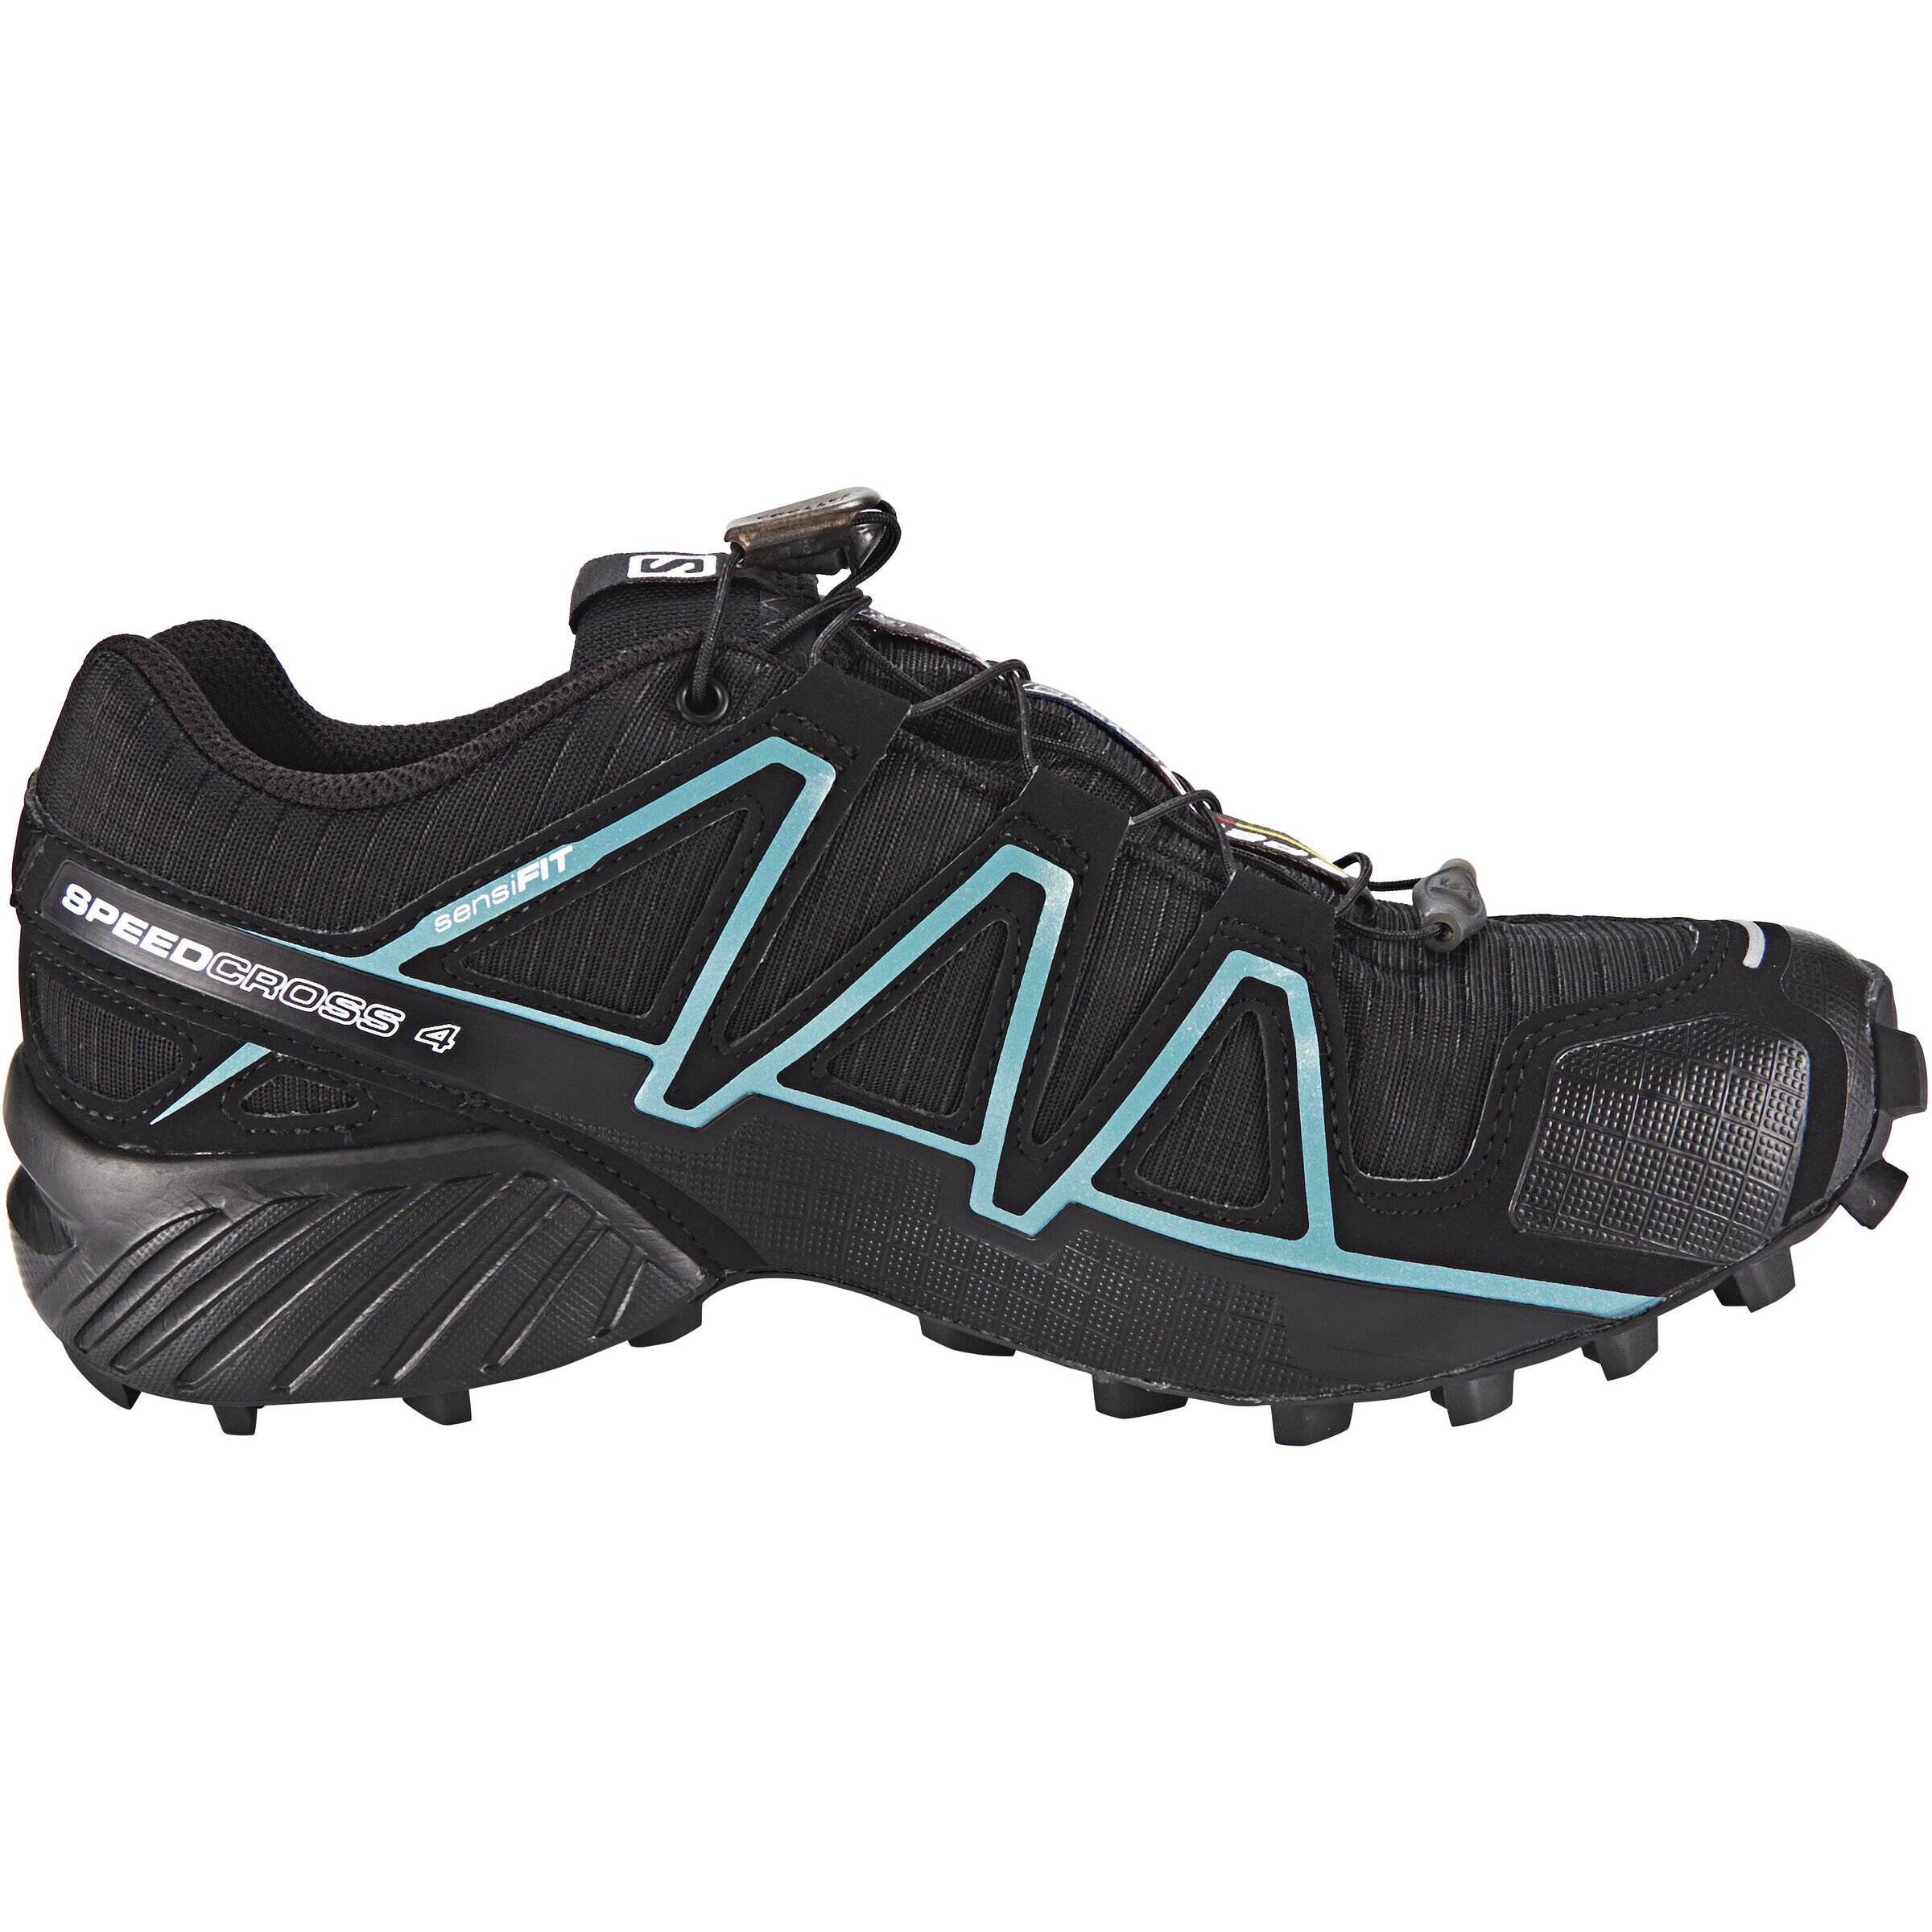 Salomon Speedcross 4 GTX Schuhe Damen blackblackmetallic bubble blue